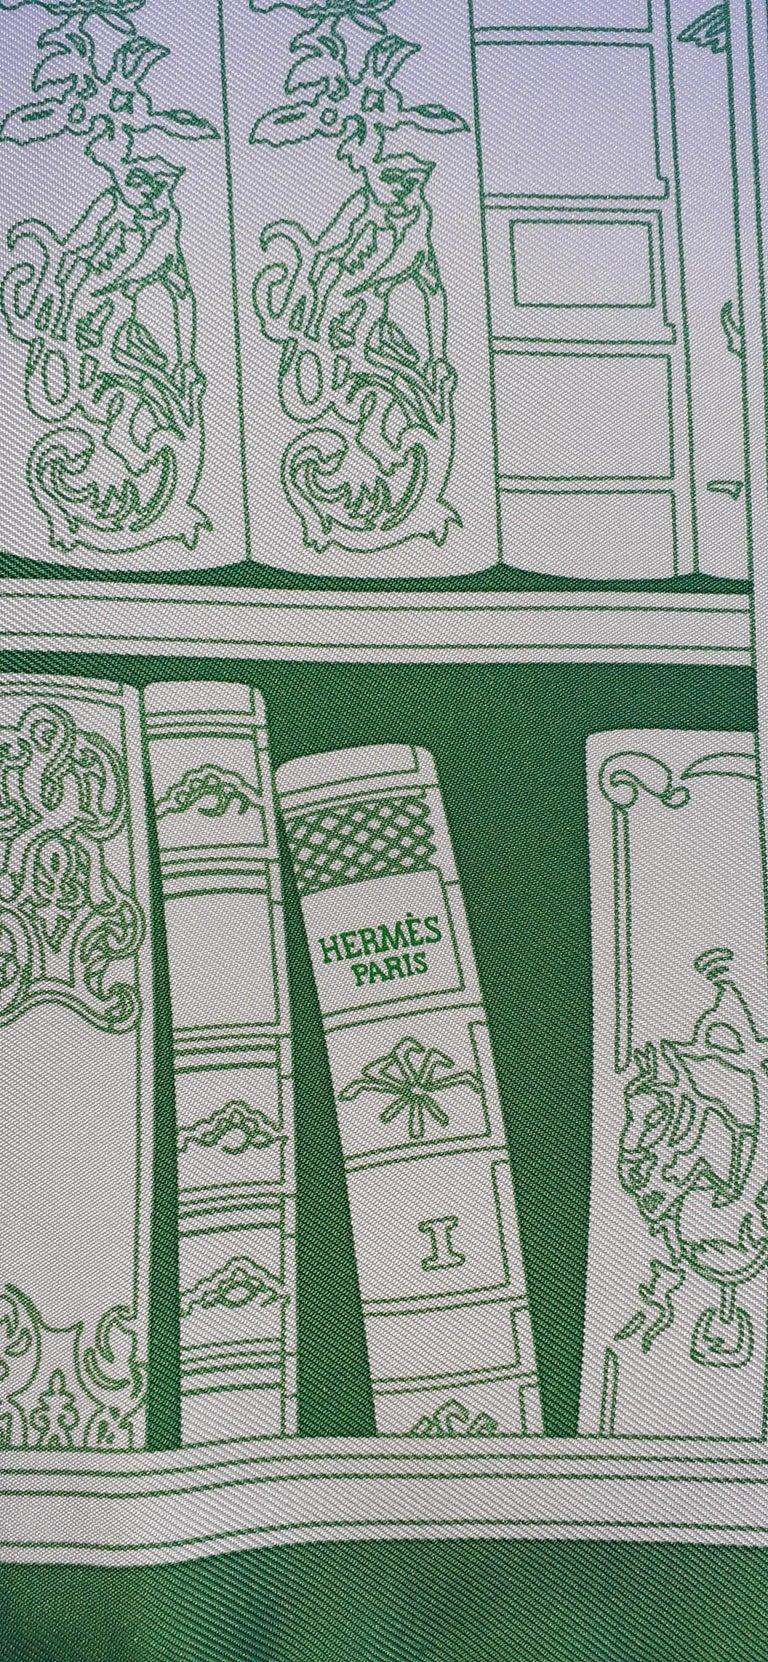 Hermès Small Silk Scarf Gavroche Bibliothèque Books White Green 42 cm 1